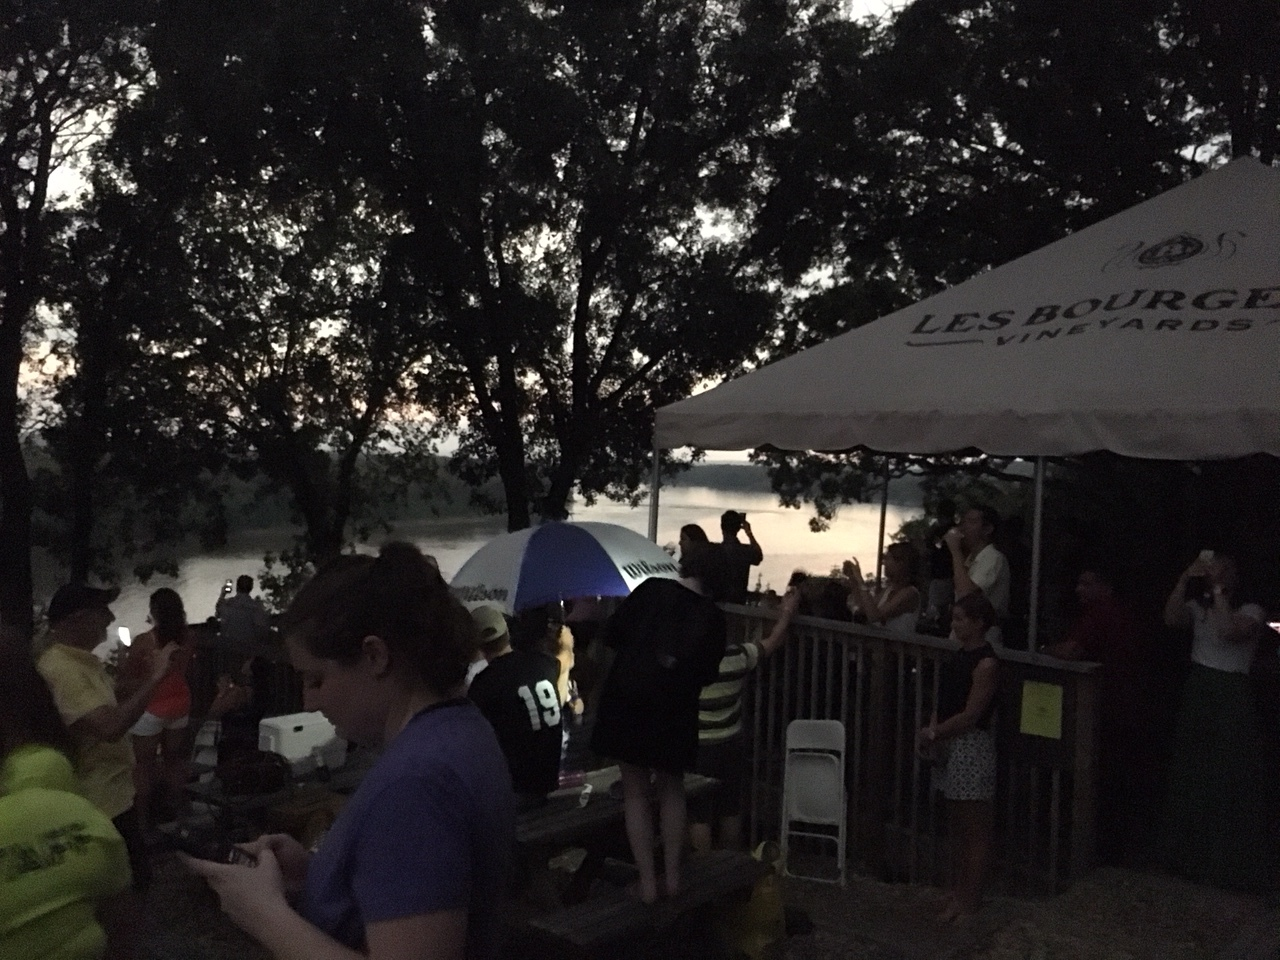 It got pretty dark! Because of the eclipse.